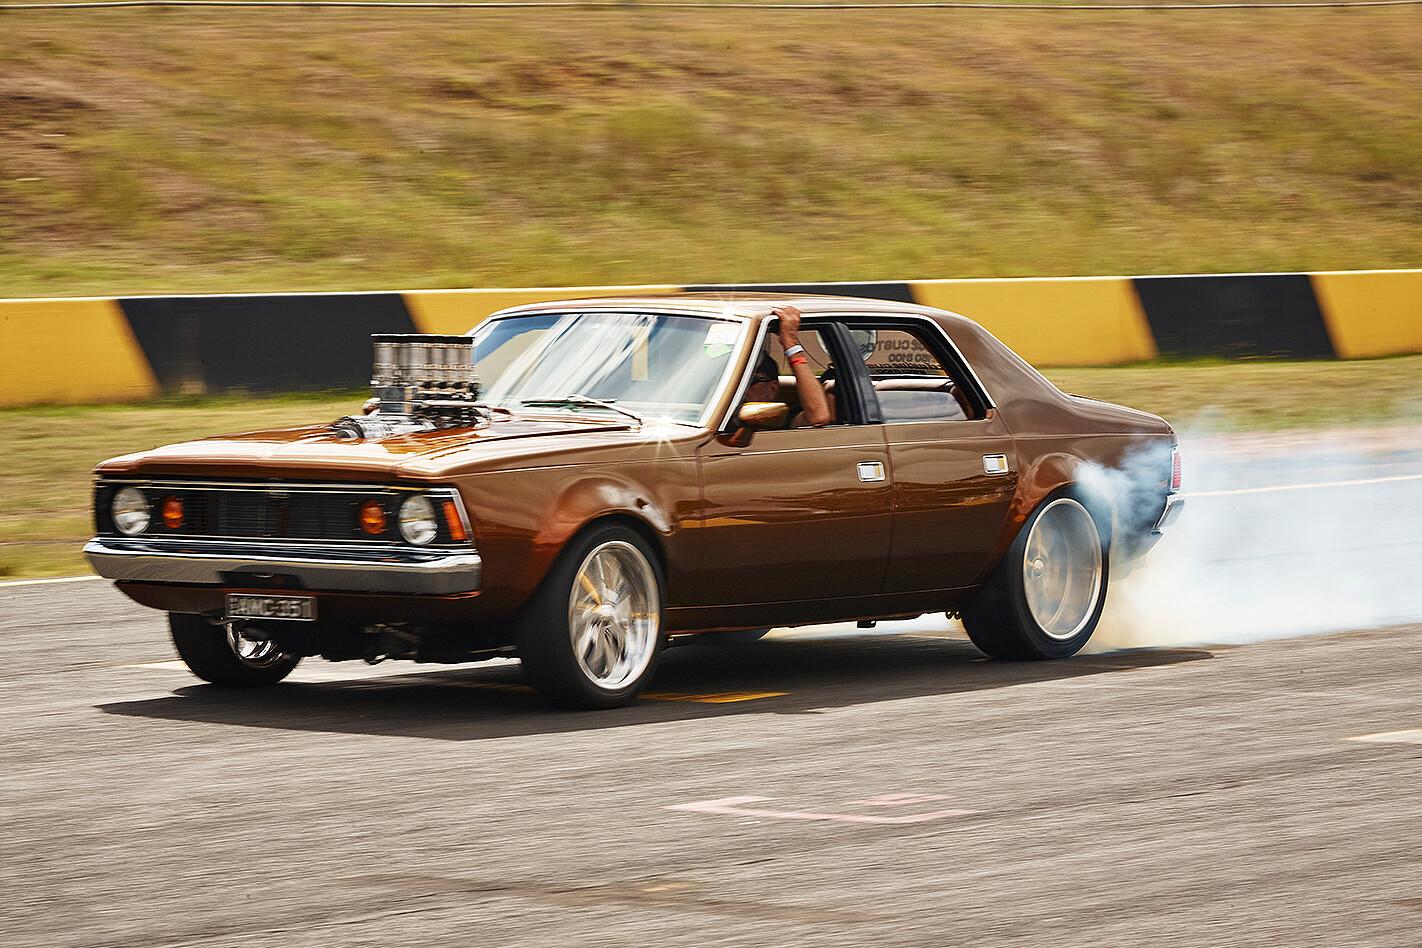 Michael Brown's Rambler Hornet at Powercruise